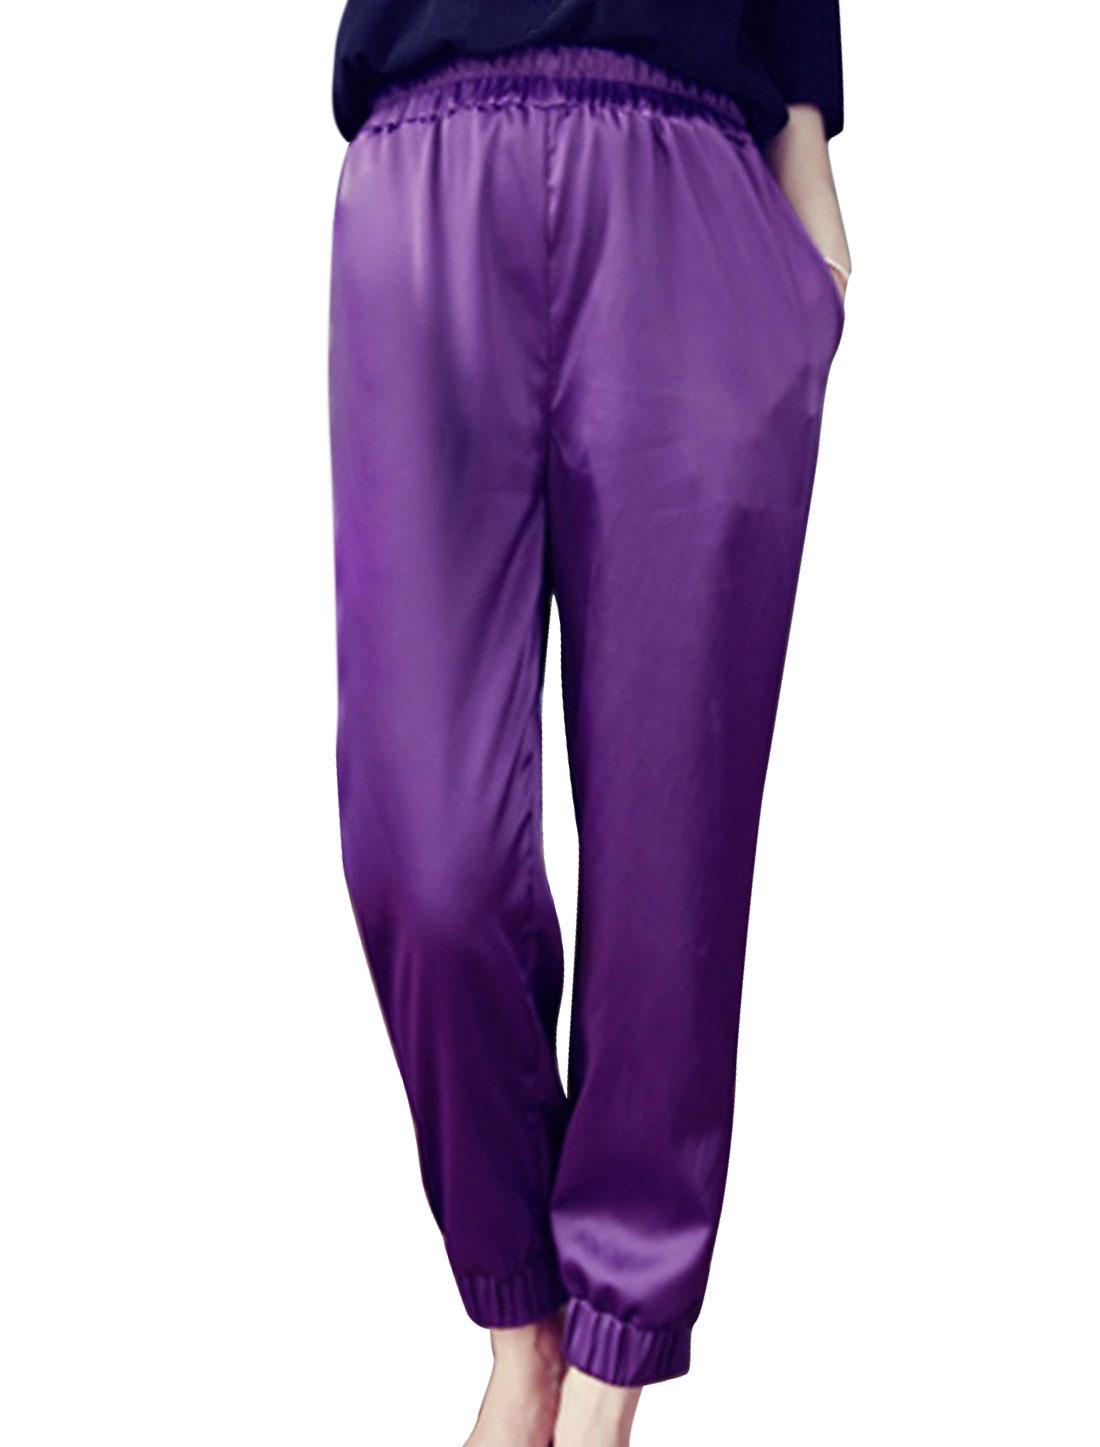 Women Elastic Waist Tight Cuffs Cropped Pants Purple XS